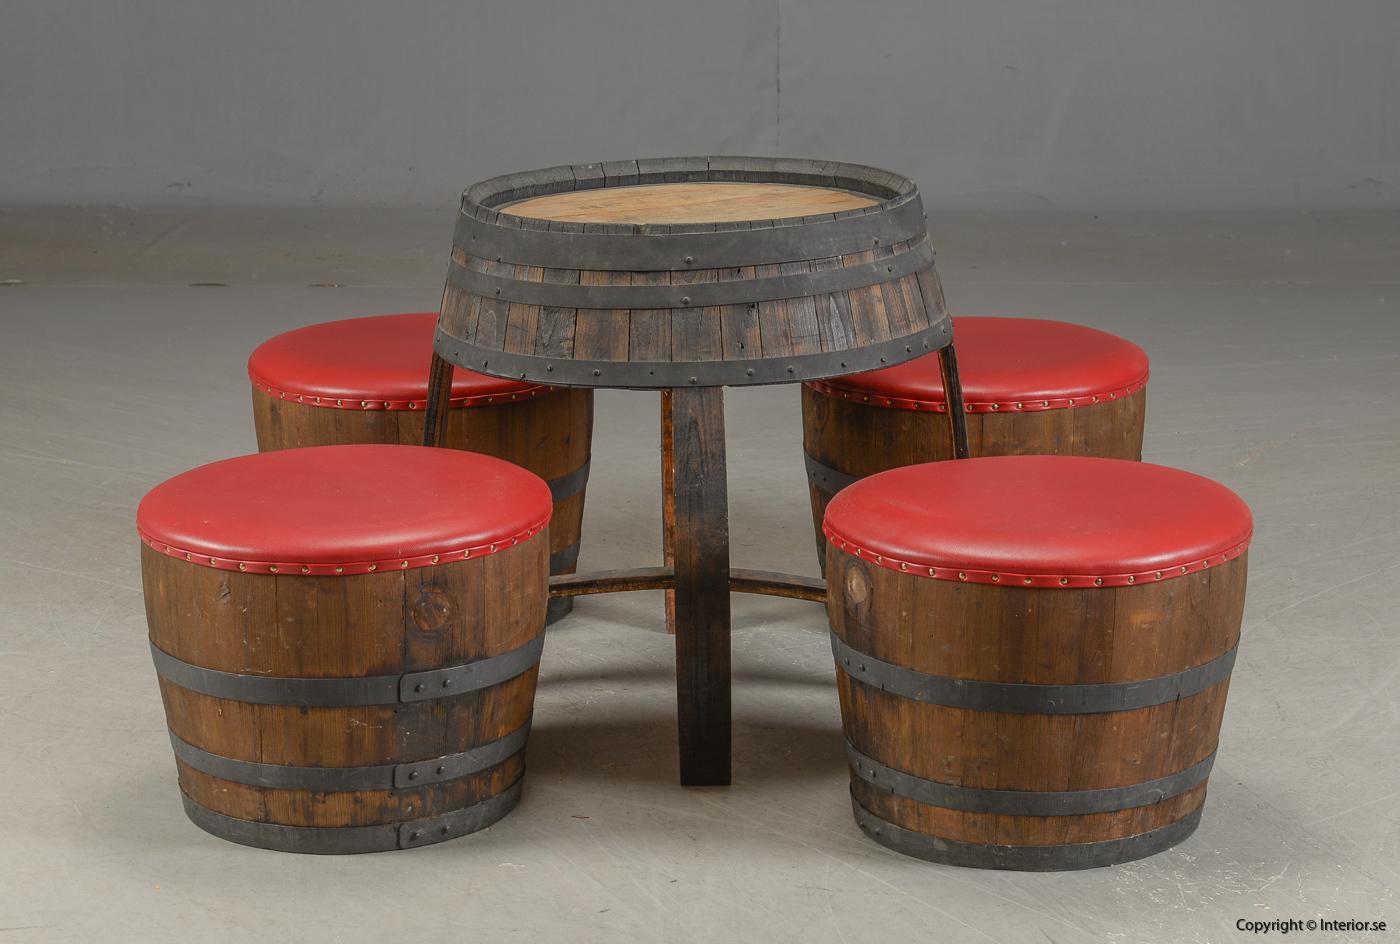 Möbler av vintunnor  wine barrels Meubels gemaakt van wijntunnels Möbel aus Weintunneln, sittpallar & bord